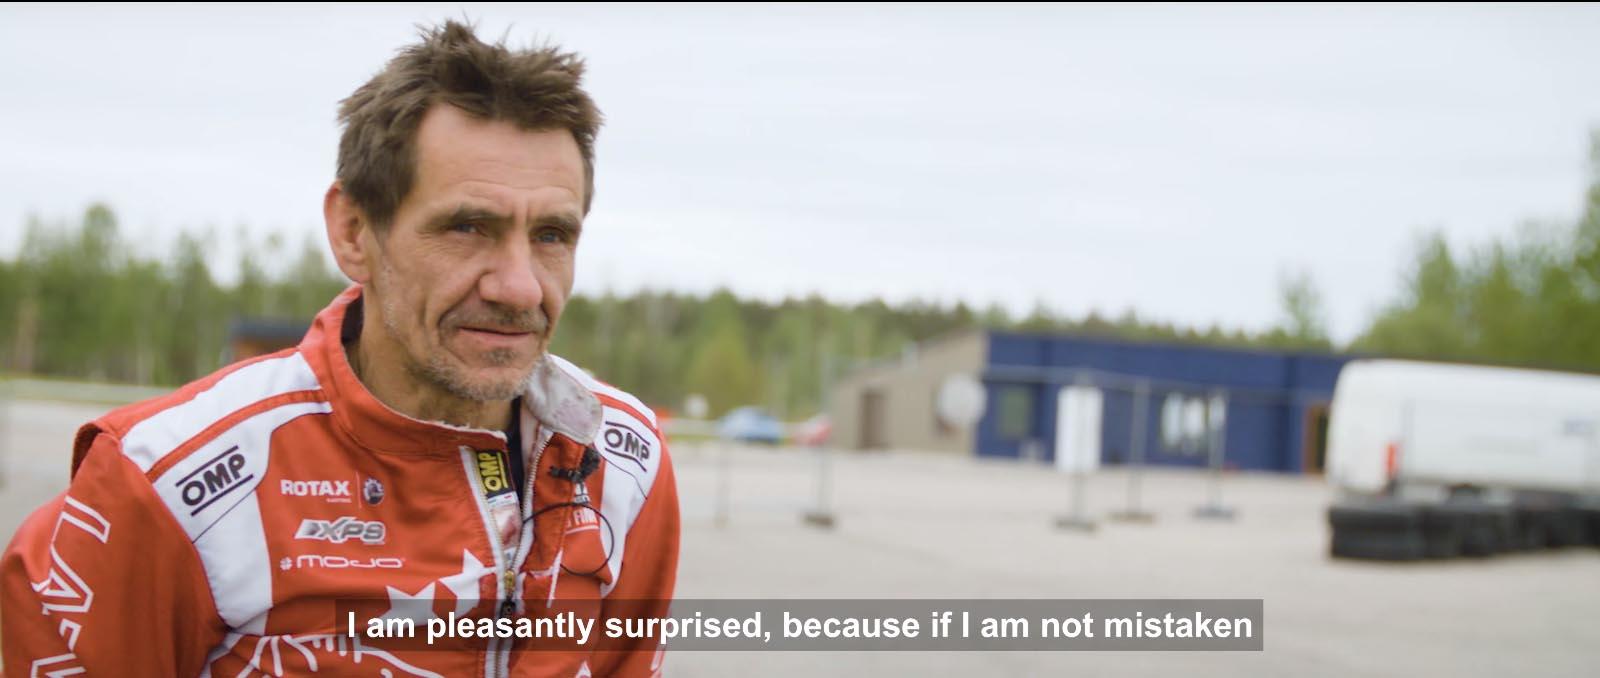 Electric Kart Championship / Eriks Gasparovics / Professional